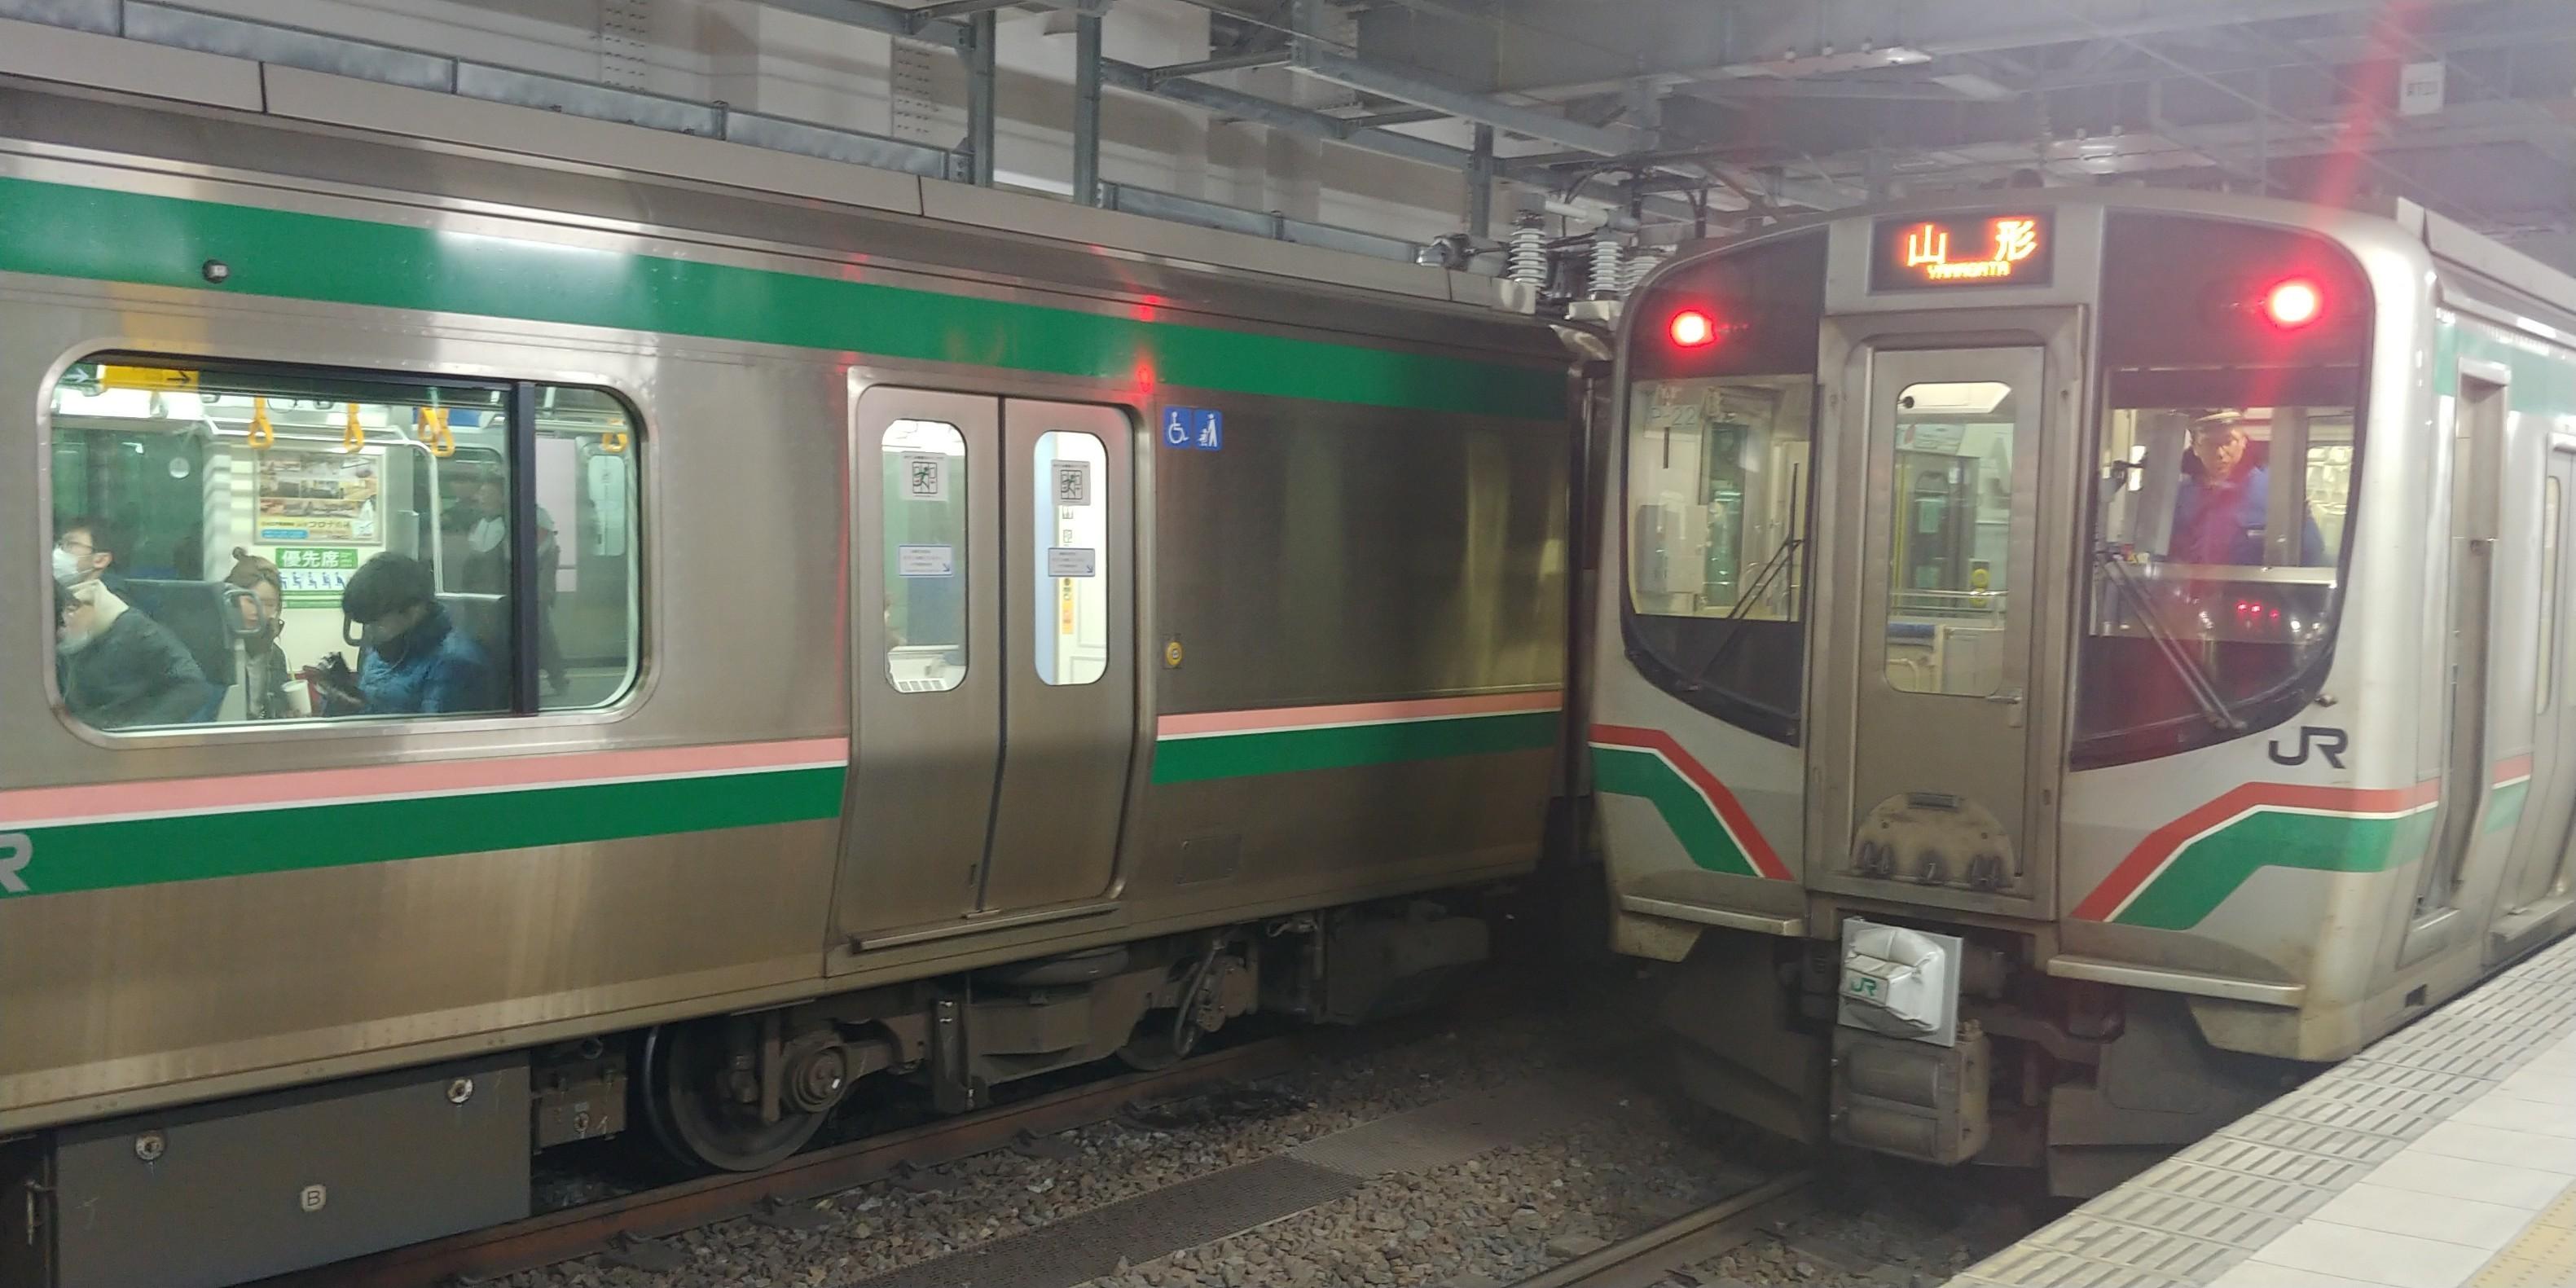 f:id:kishuji-kaisoku:20200127110804j:image